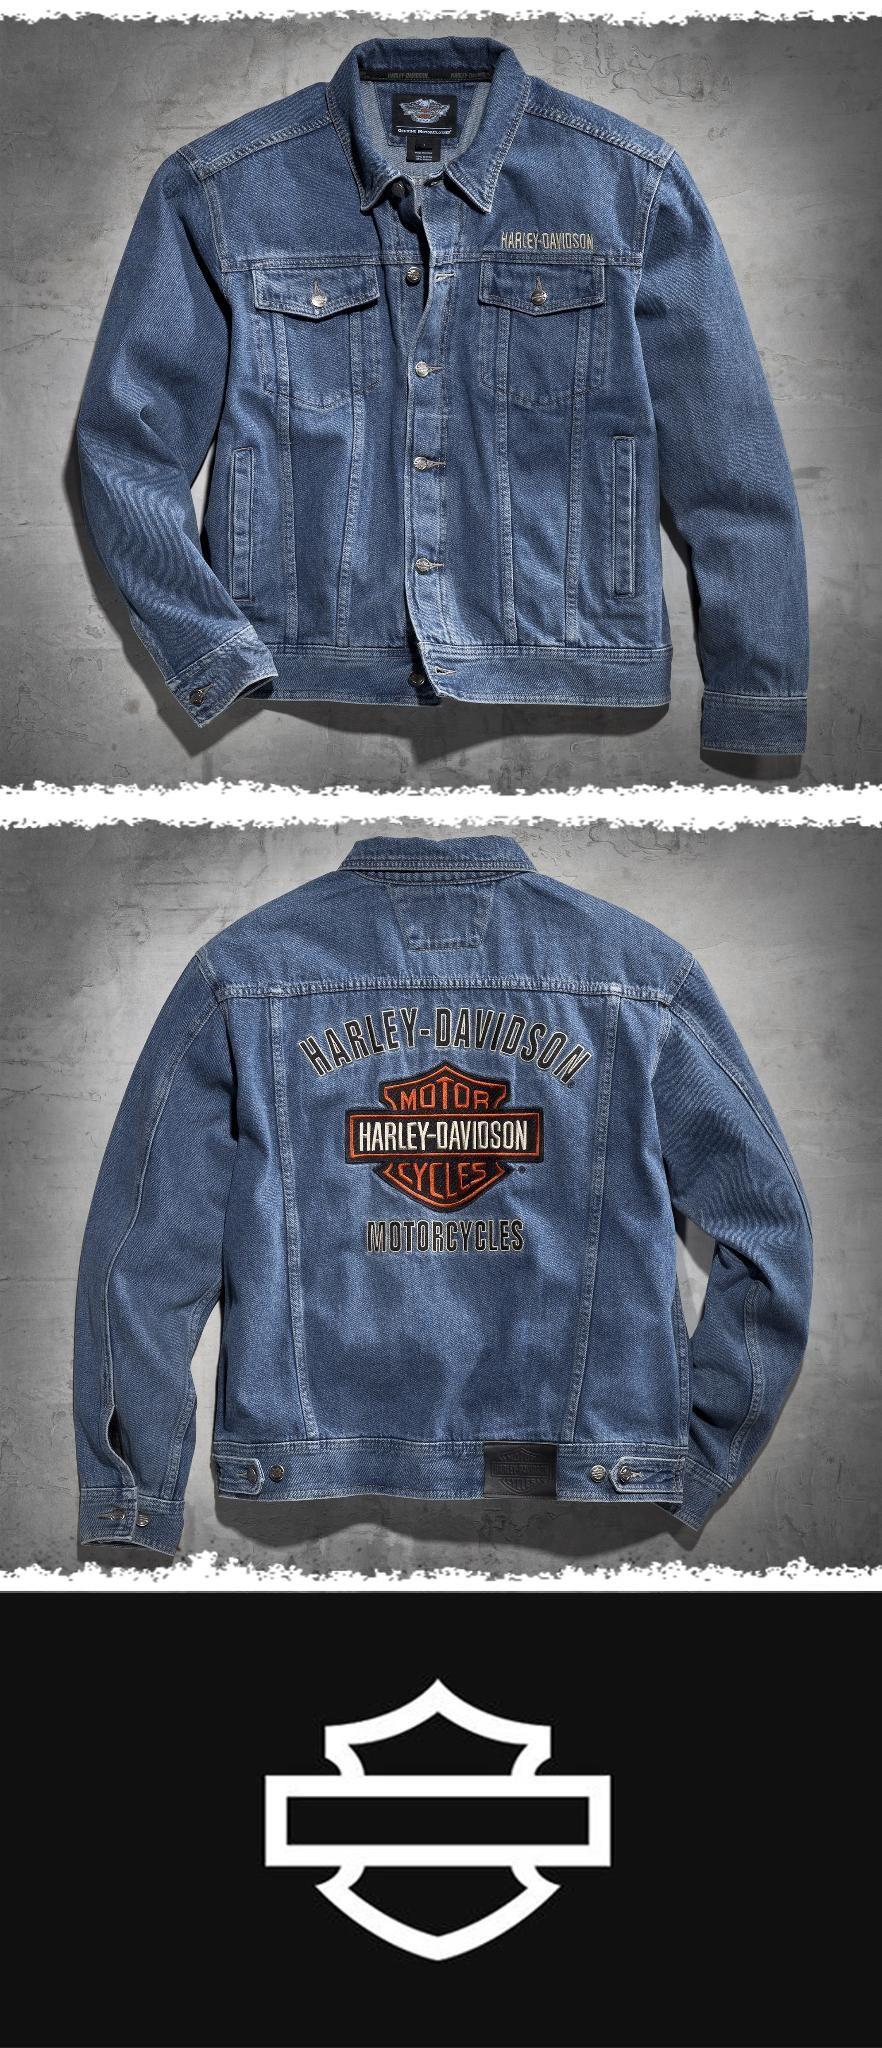 6f4017200f63 Bar & Shield Denim Jacket | H-D Gear For Him | Harley davidson jeans ...